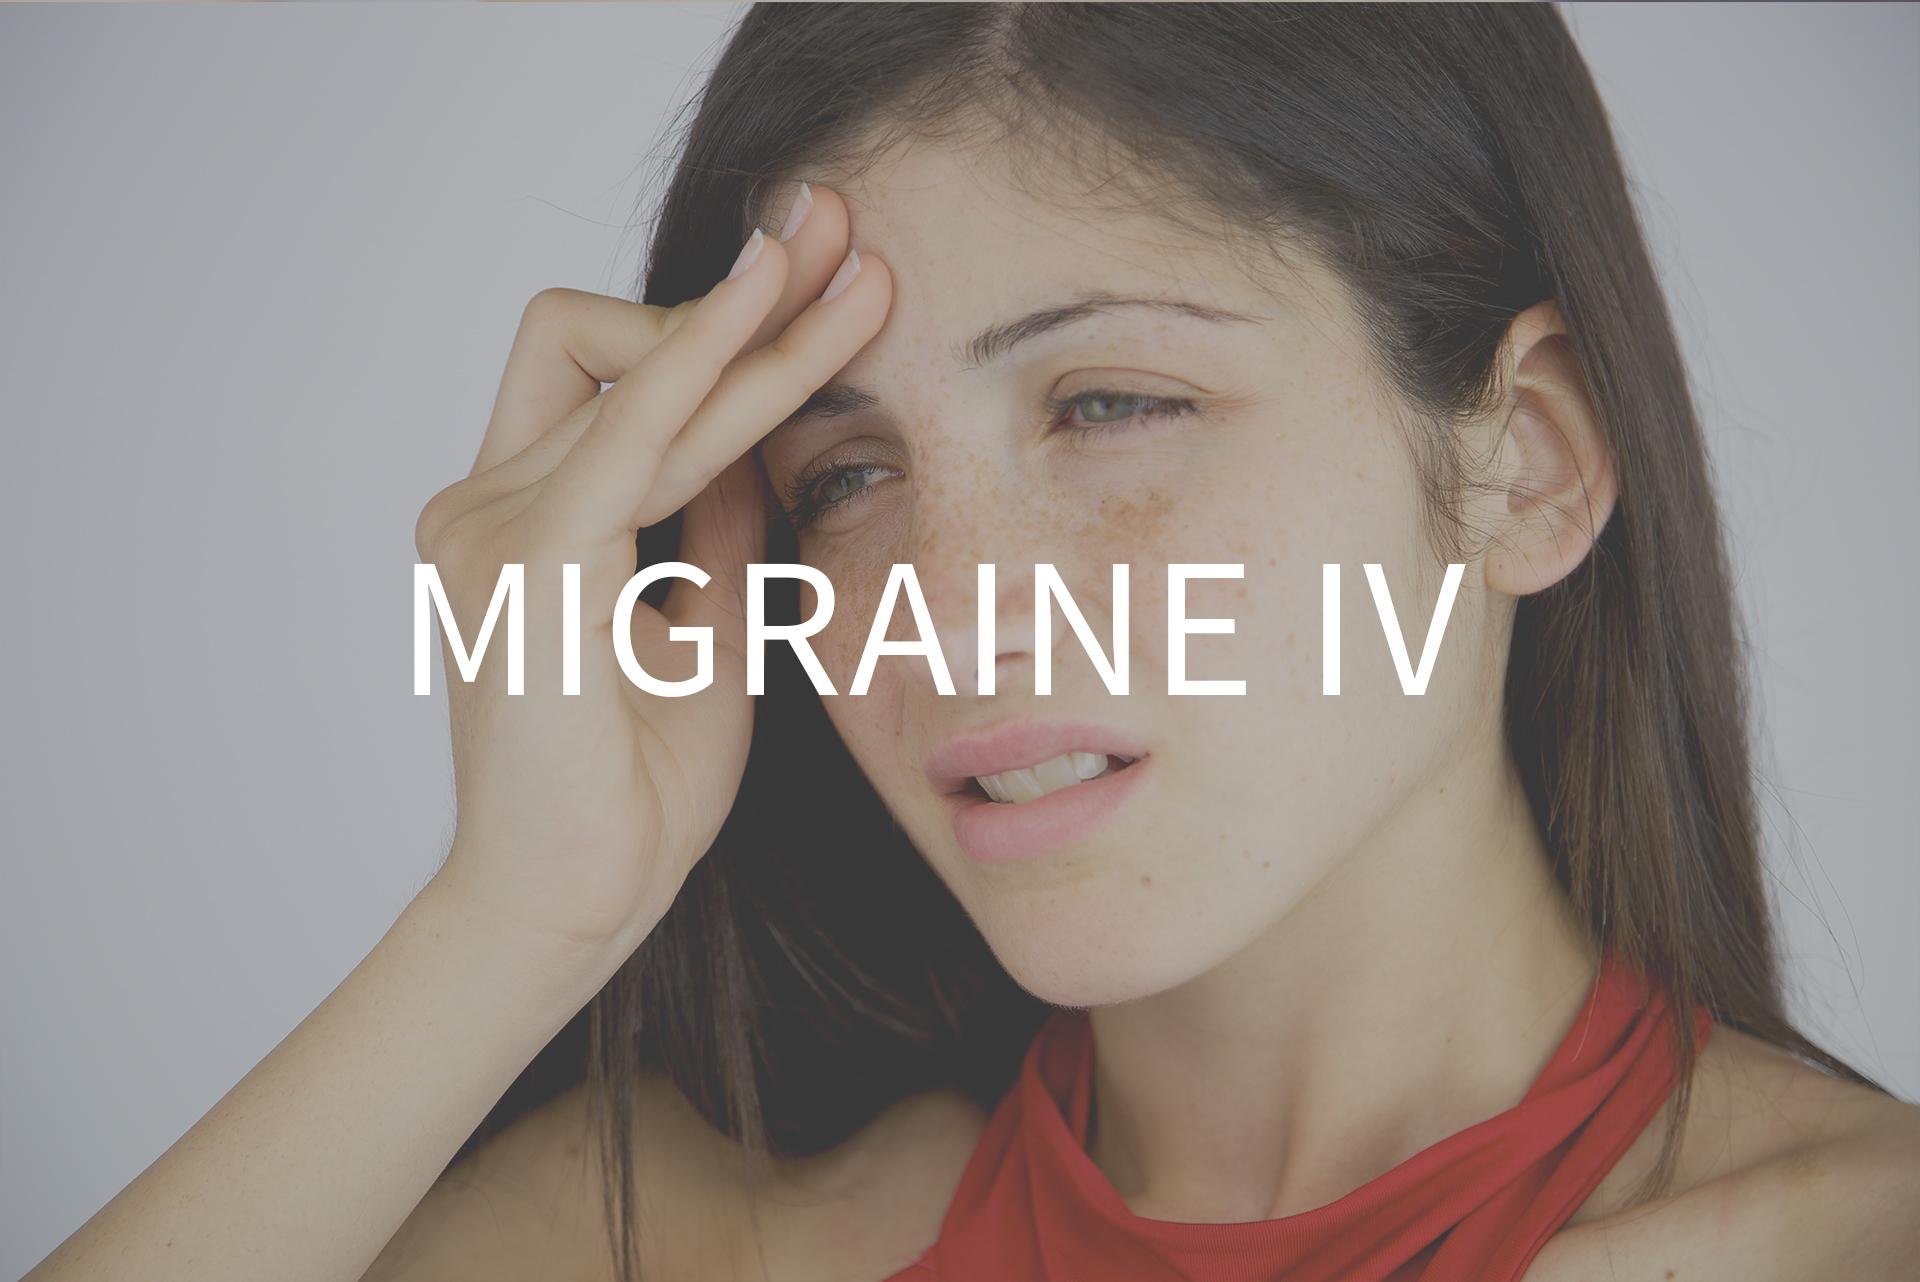 Emerald Migraine IV